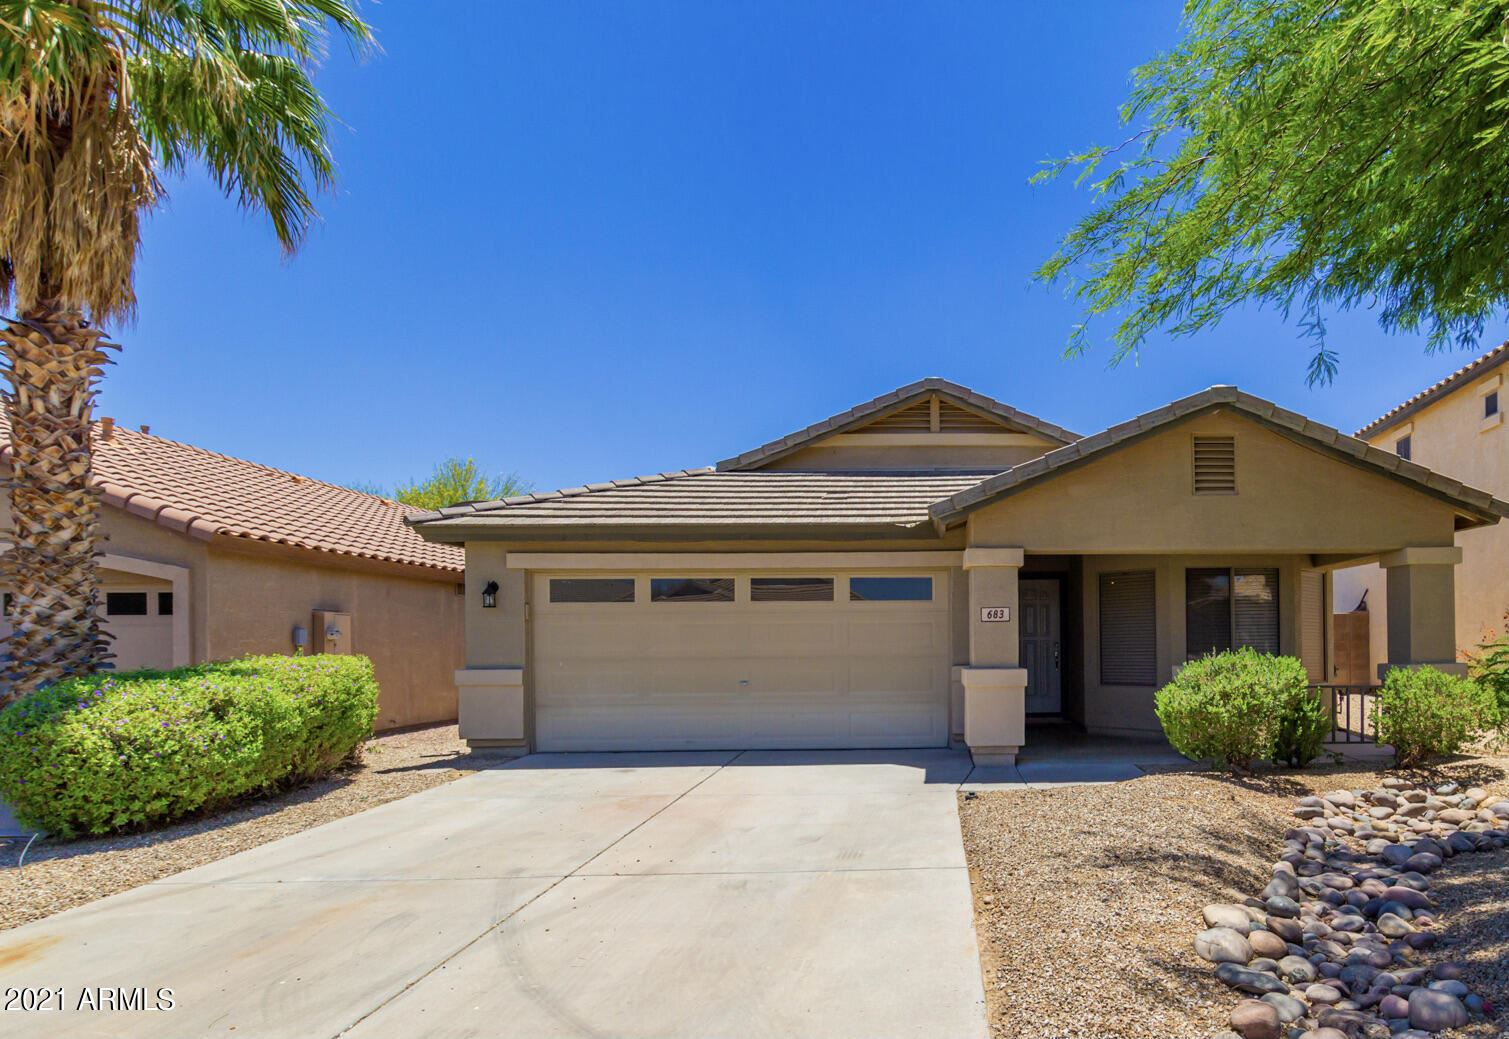 Photo of 683 E LOVEGRASS Drive, San Tan Valley, AZ 85143 (MLS # 6249930)